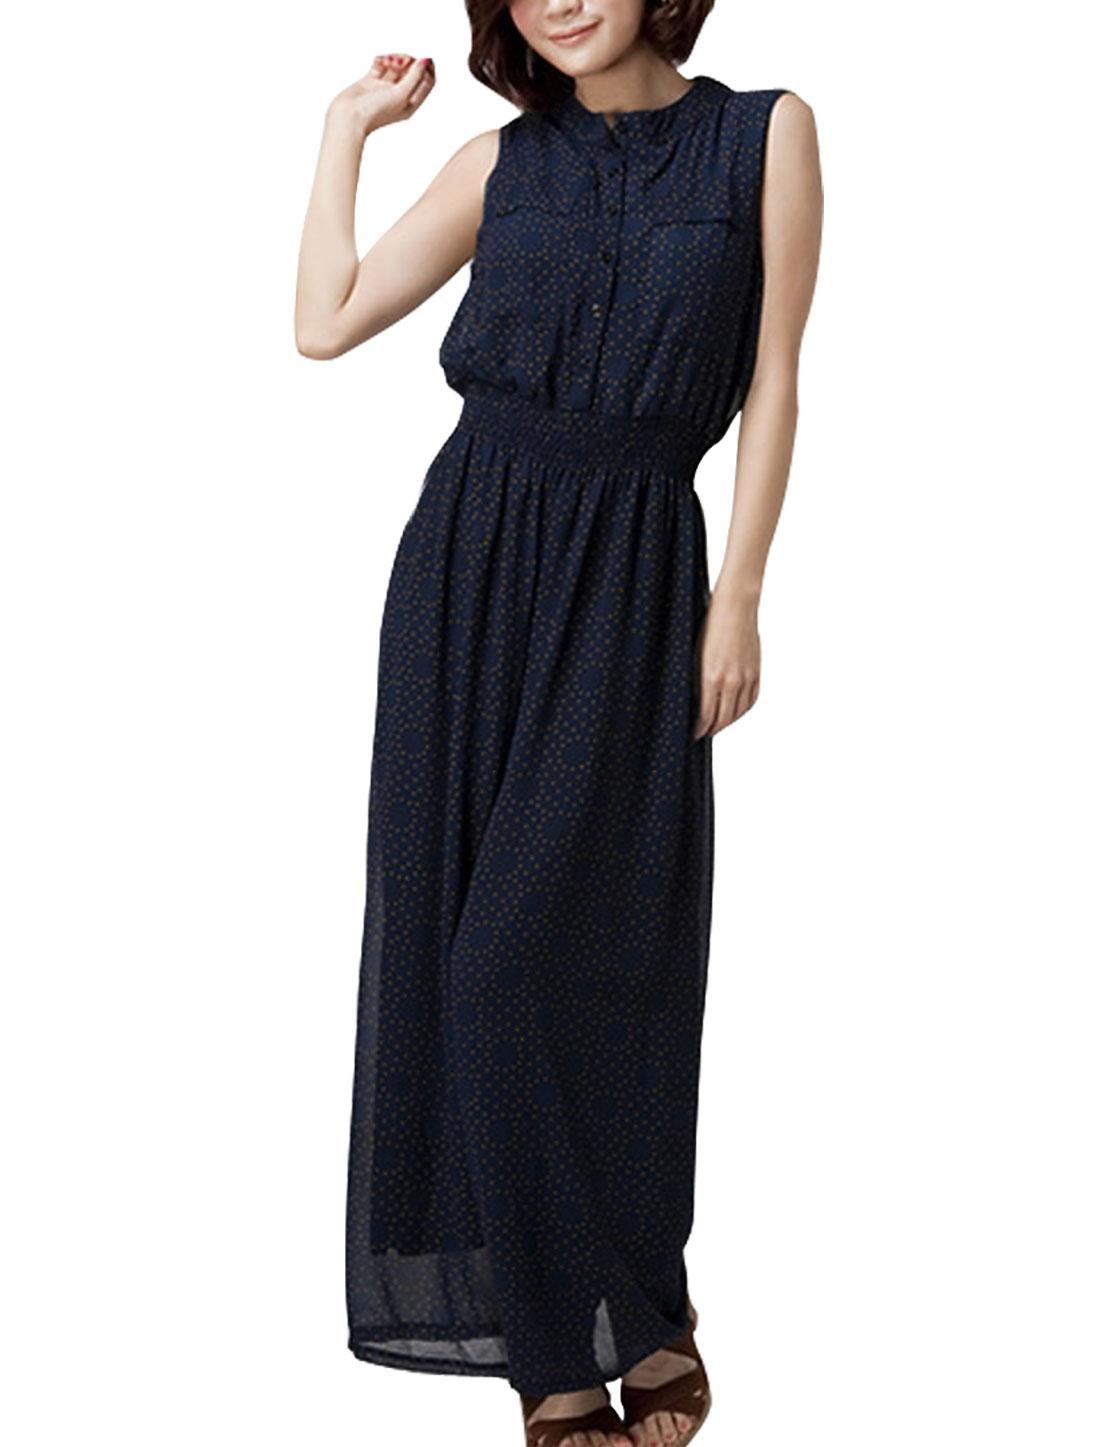 Ladies Dots Round Neck Chiffon Stretchy Autumn Jumpsuit Blue XS